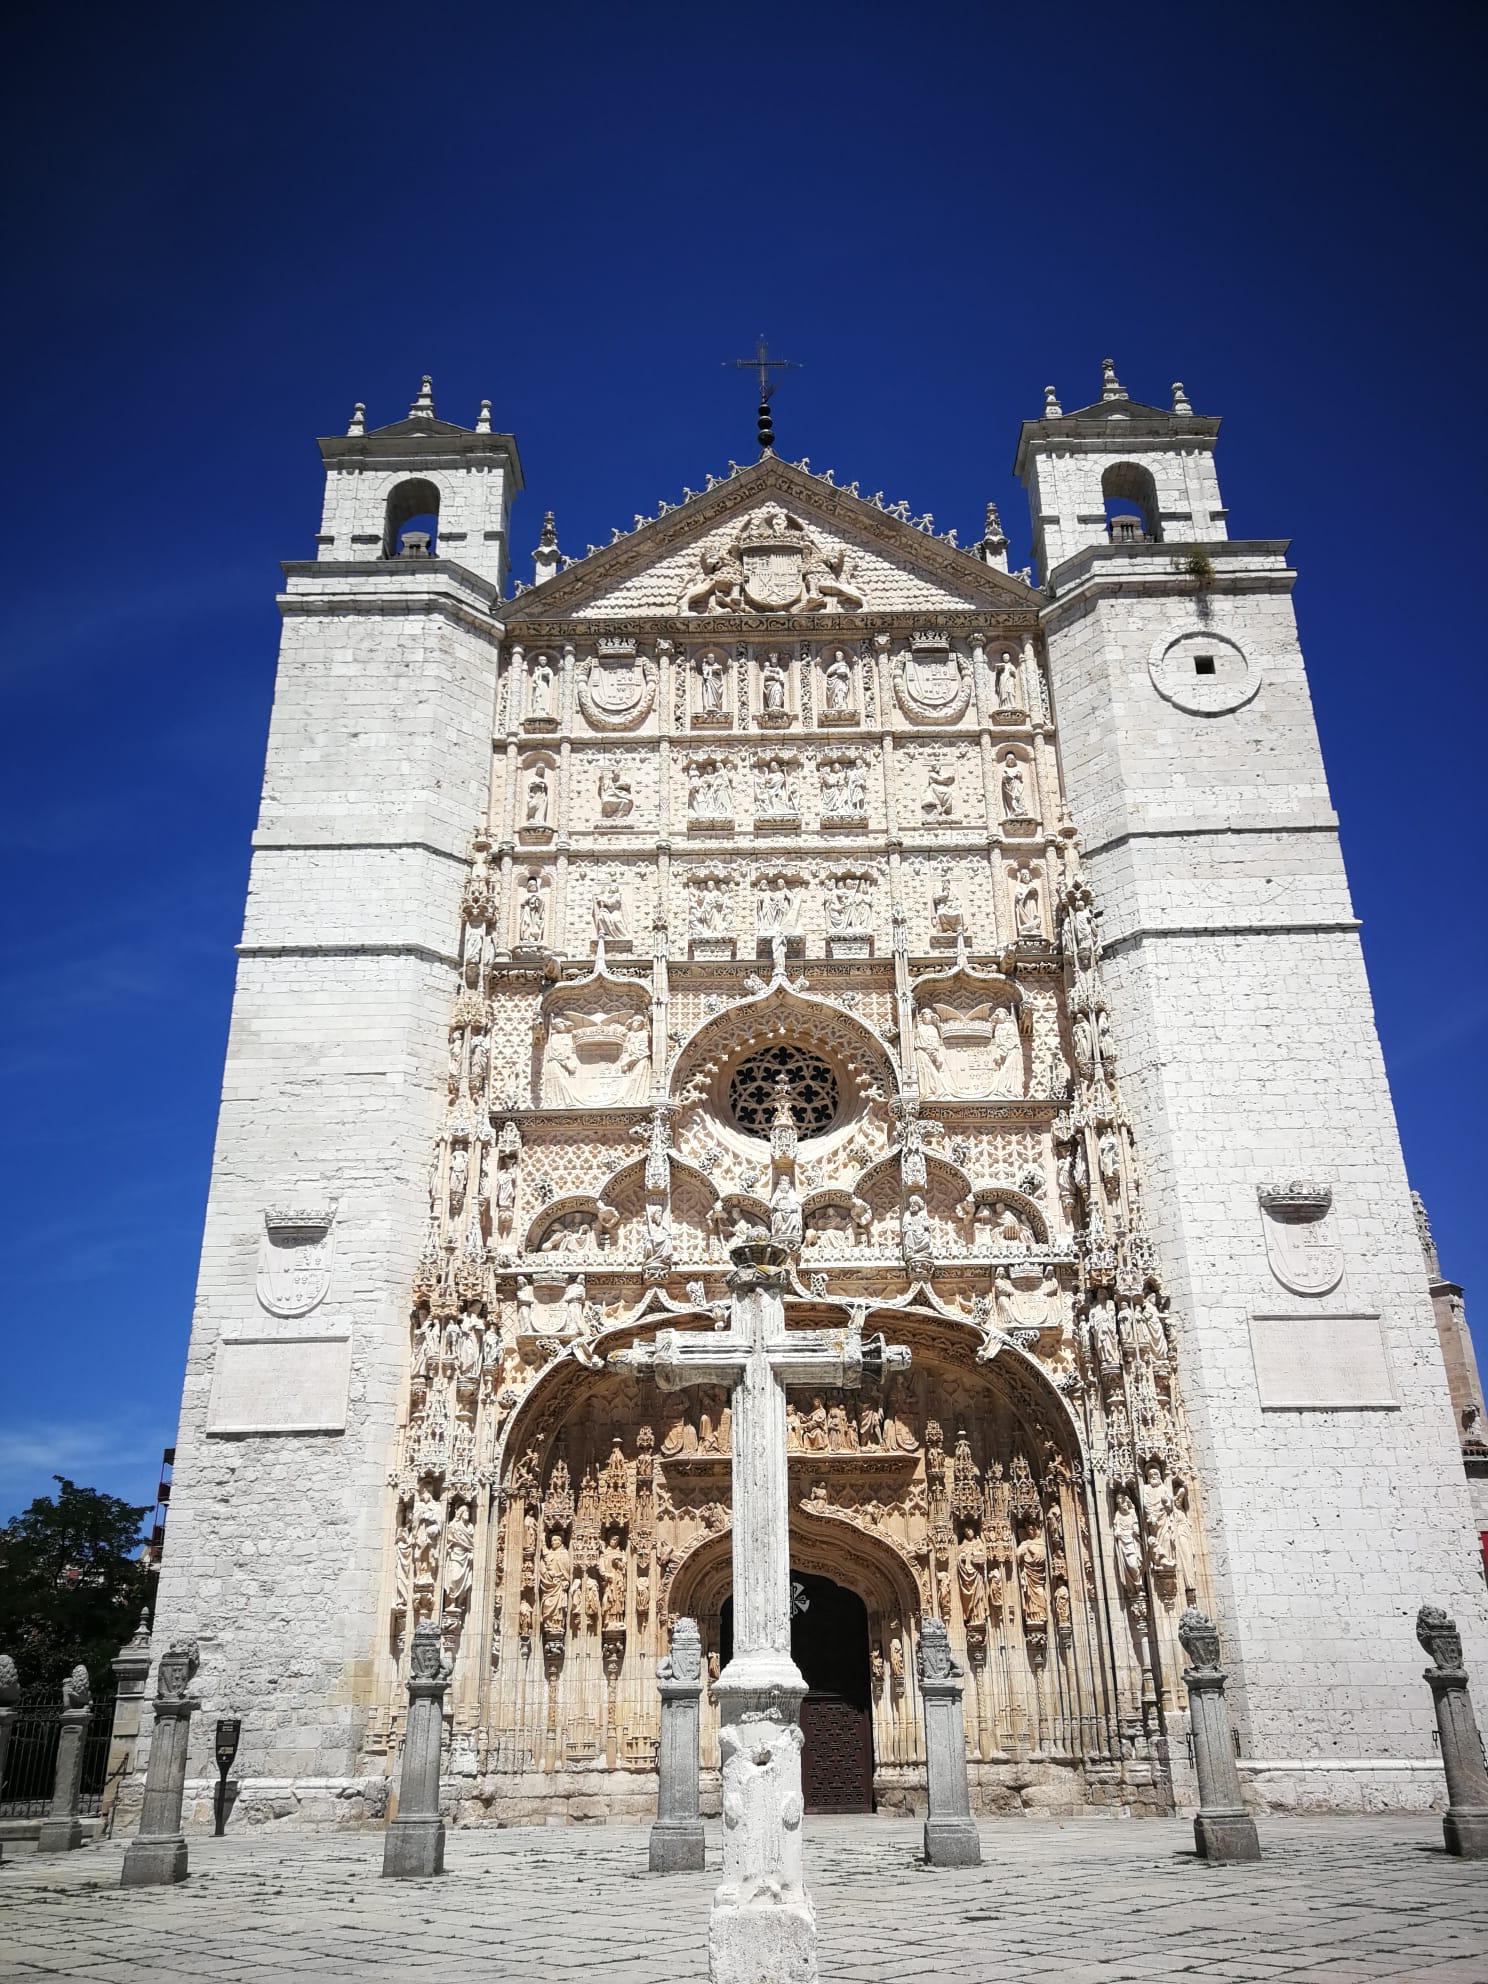 Фасад церкви Святого Павла. XV. Вальядолид